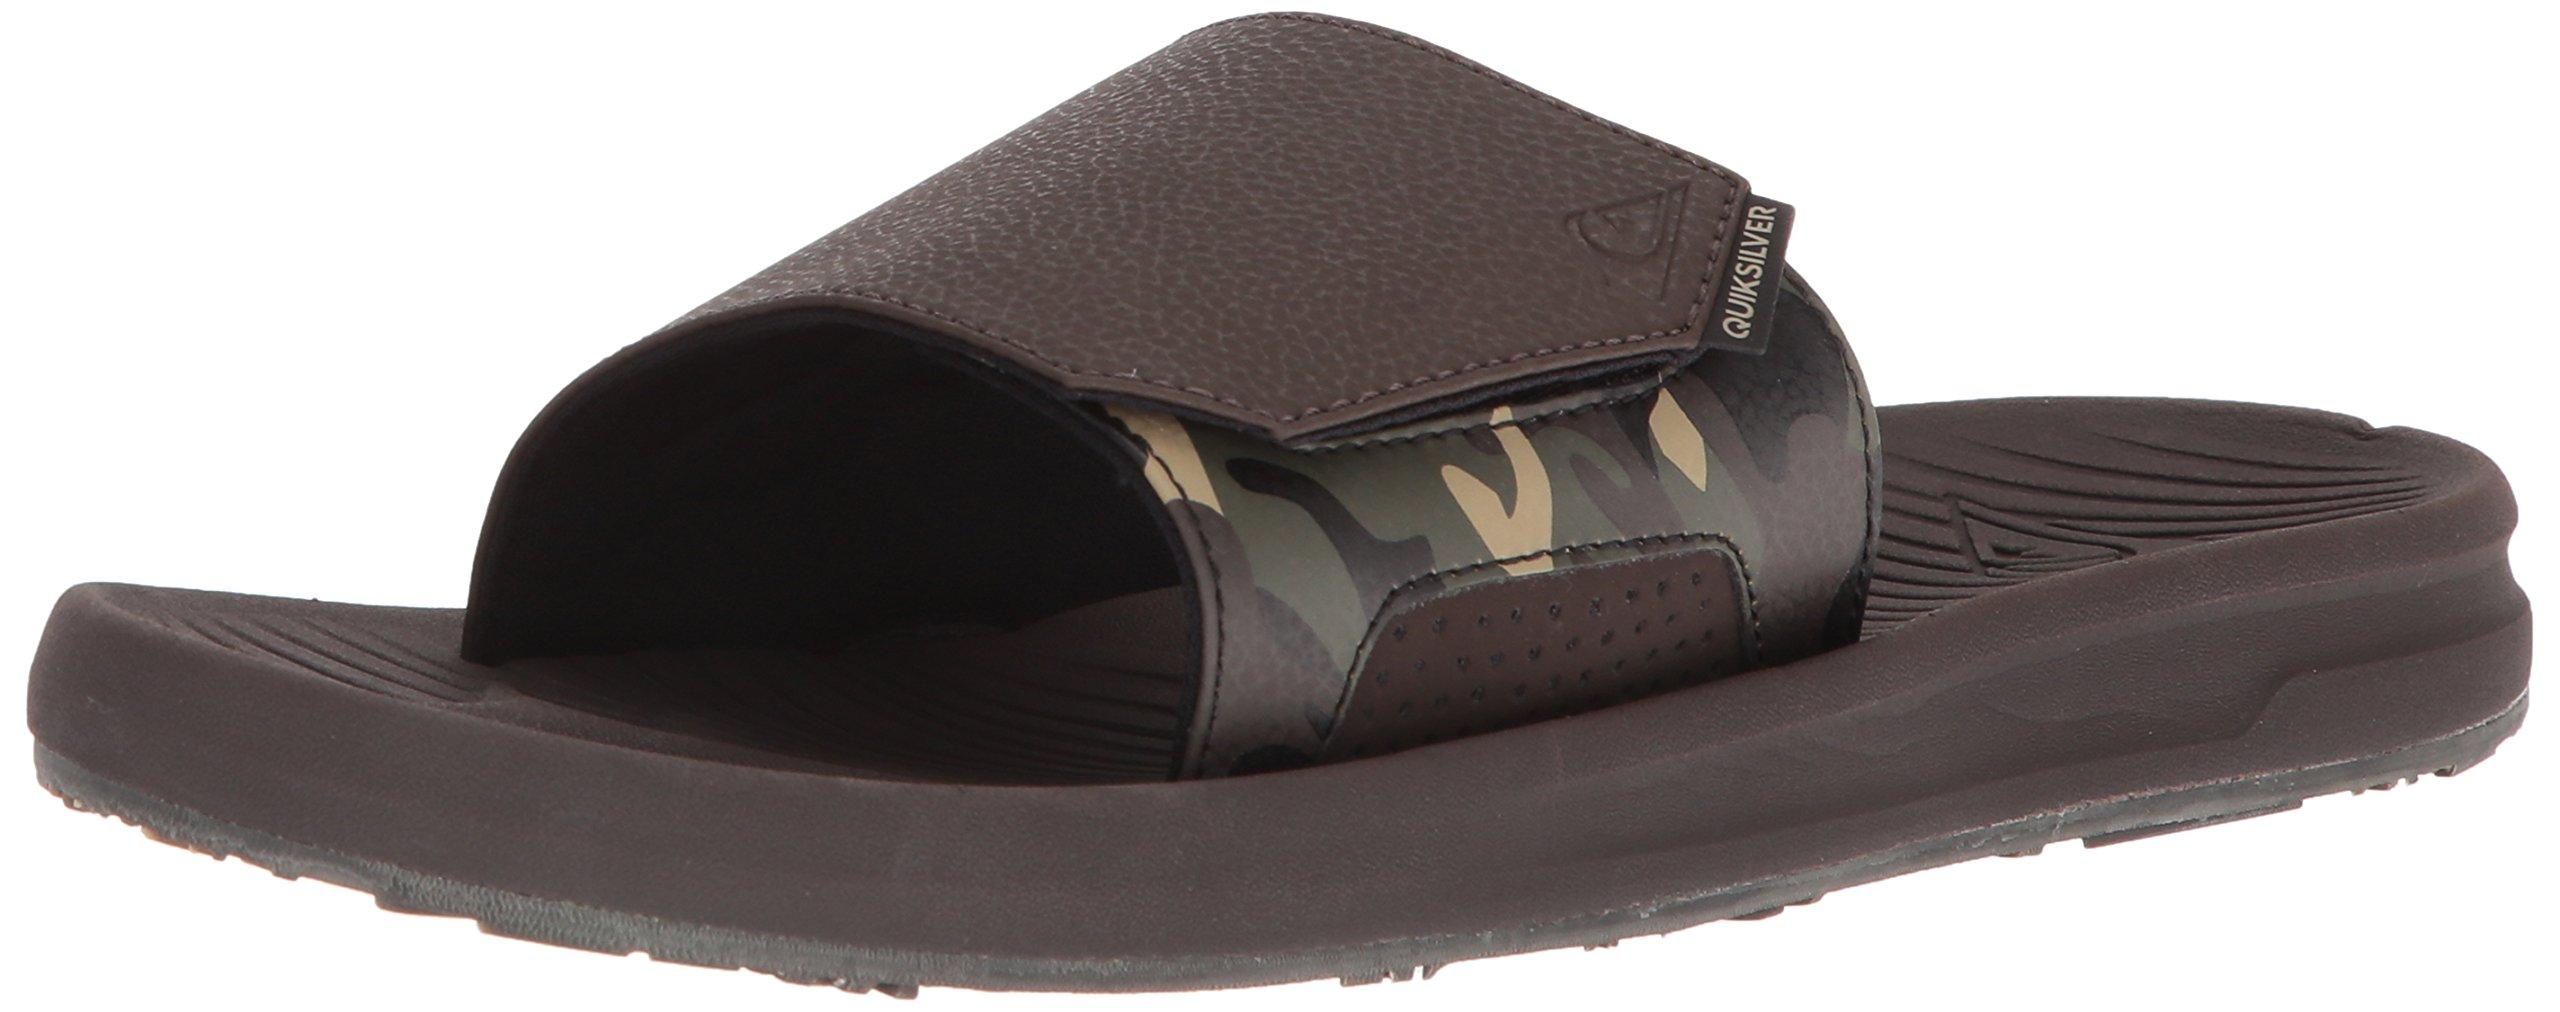 Quiksilver Men's Travel Oasis Slide Sandal, Brown/Brown/Brown, 9(42) M US